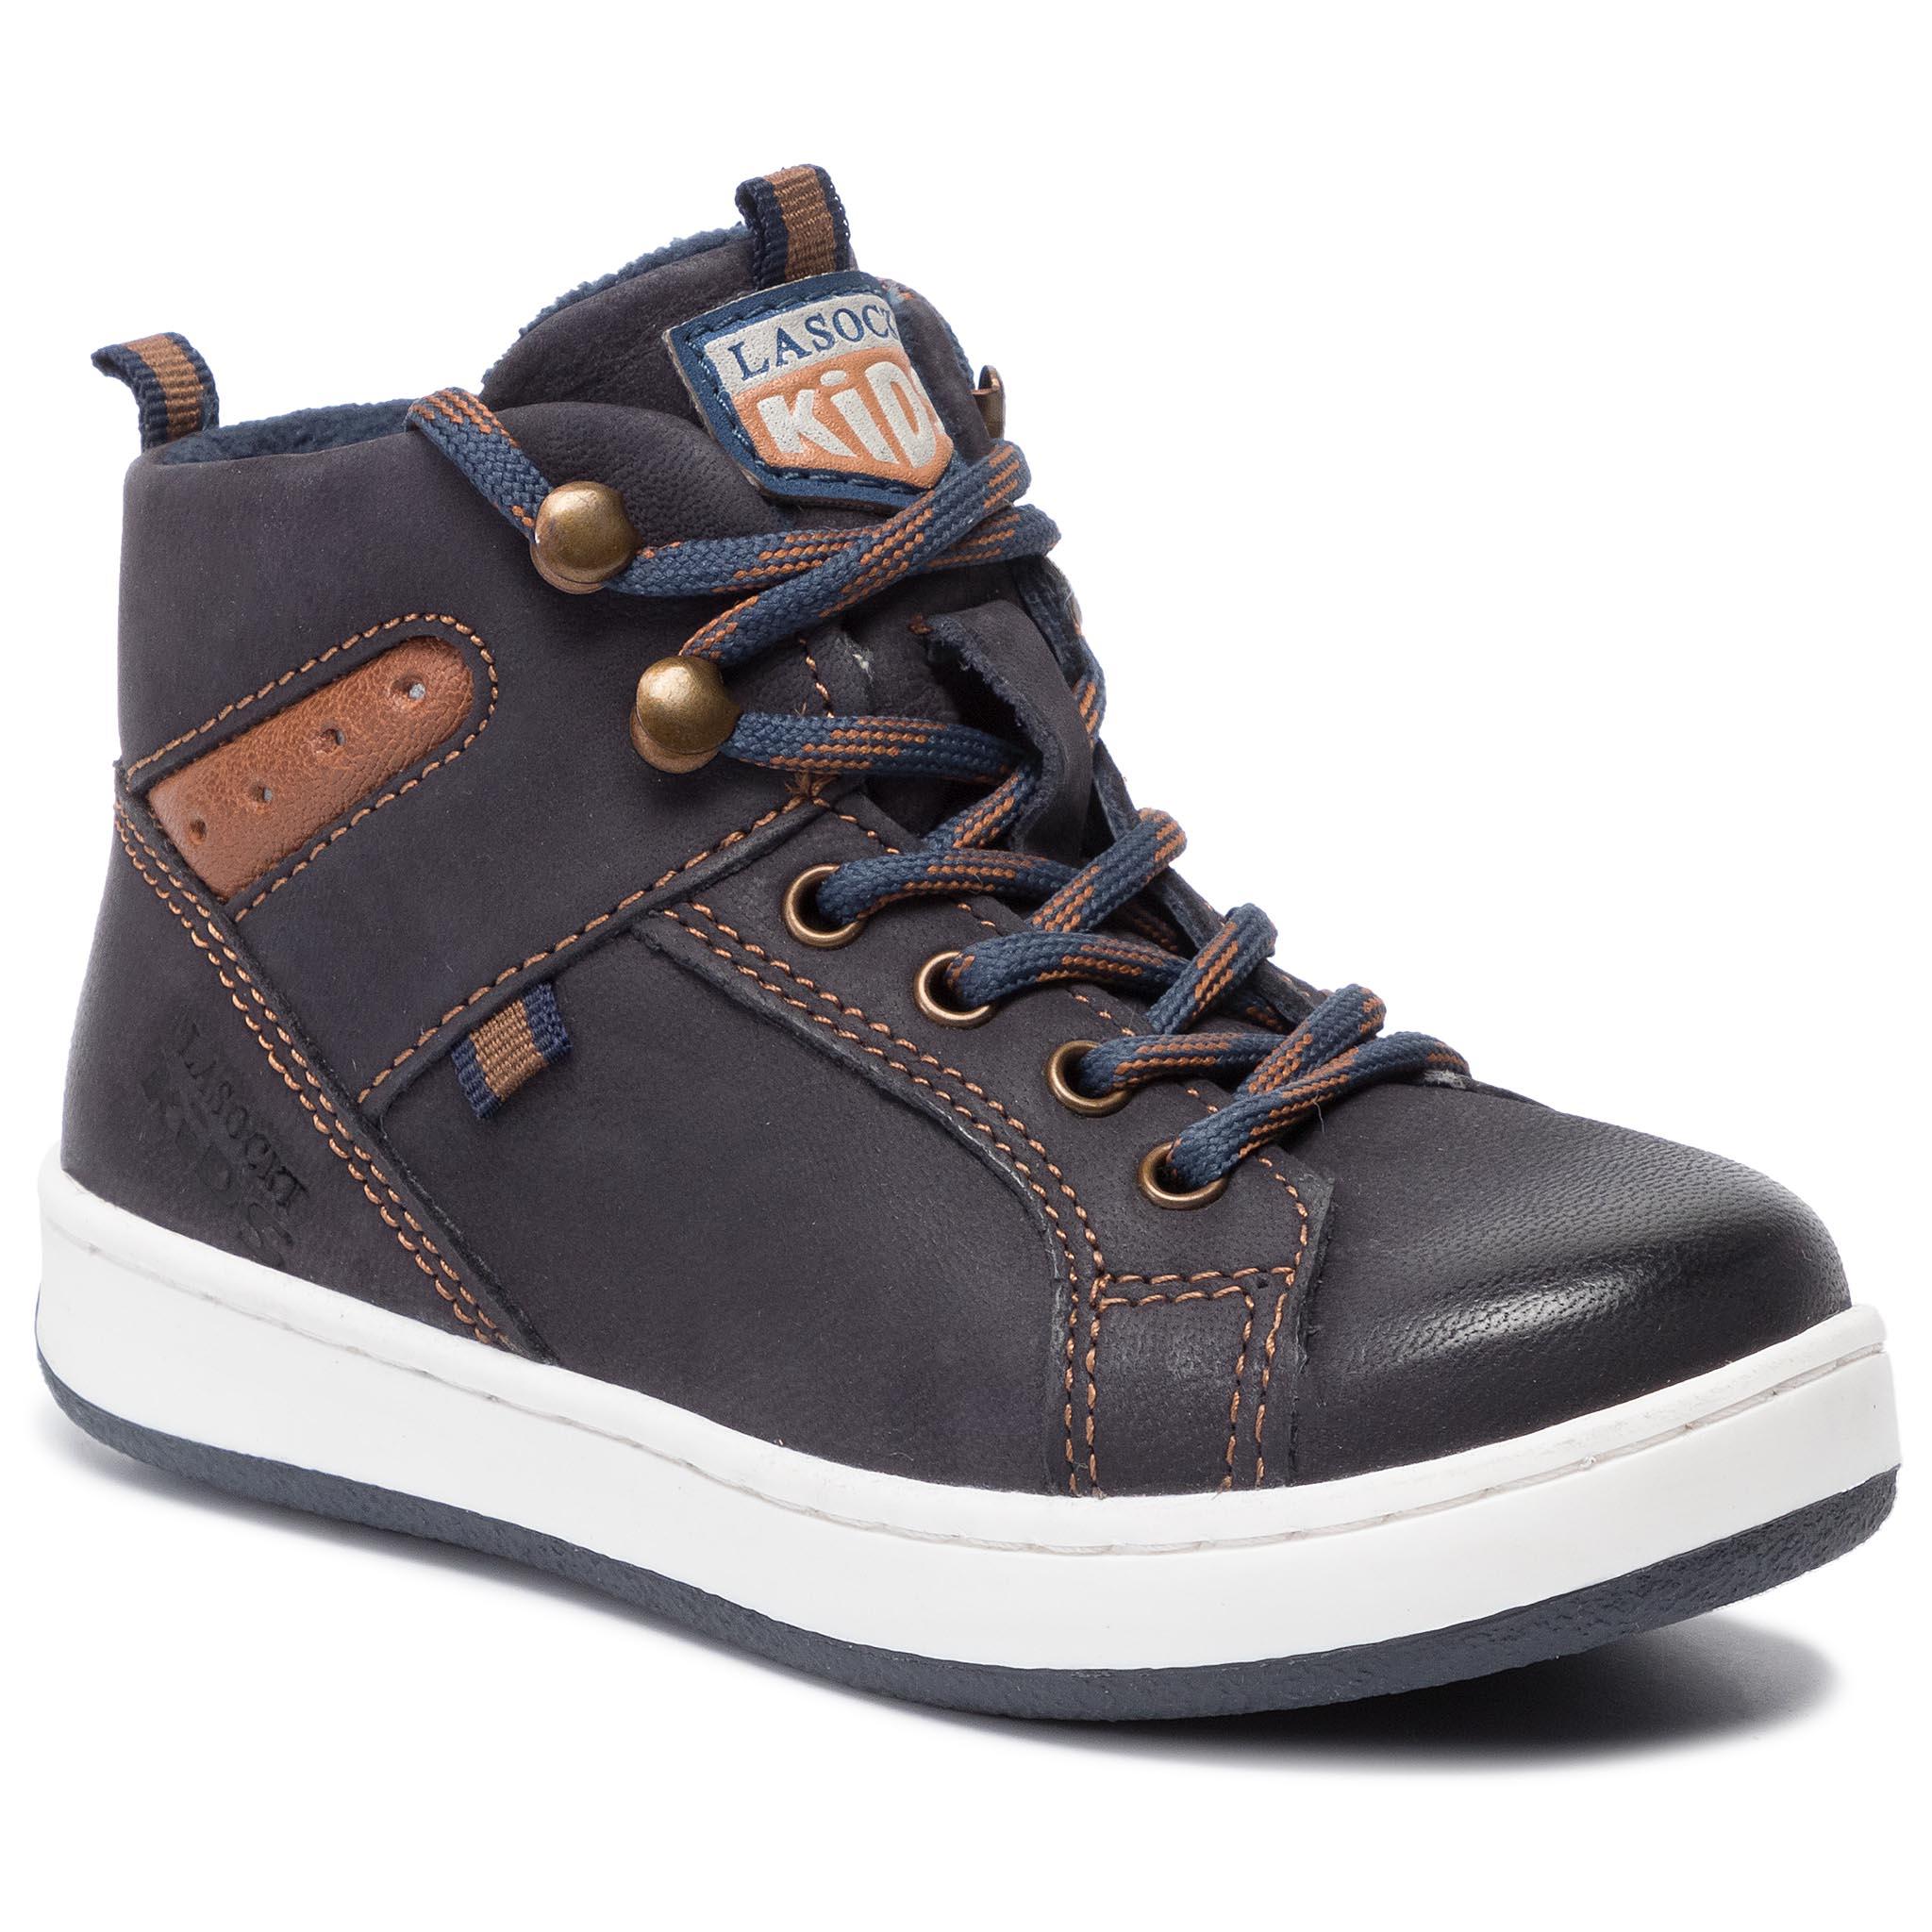 Outdoorová obuv LASOCKI KIDS - CI12-2935-11 Cobalt Blue